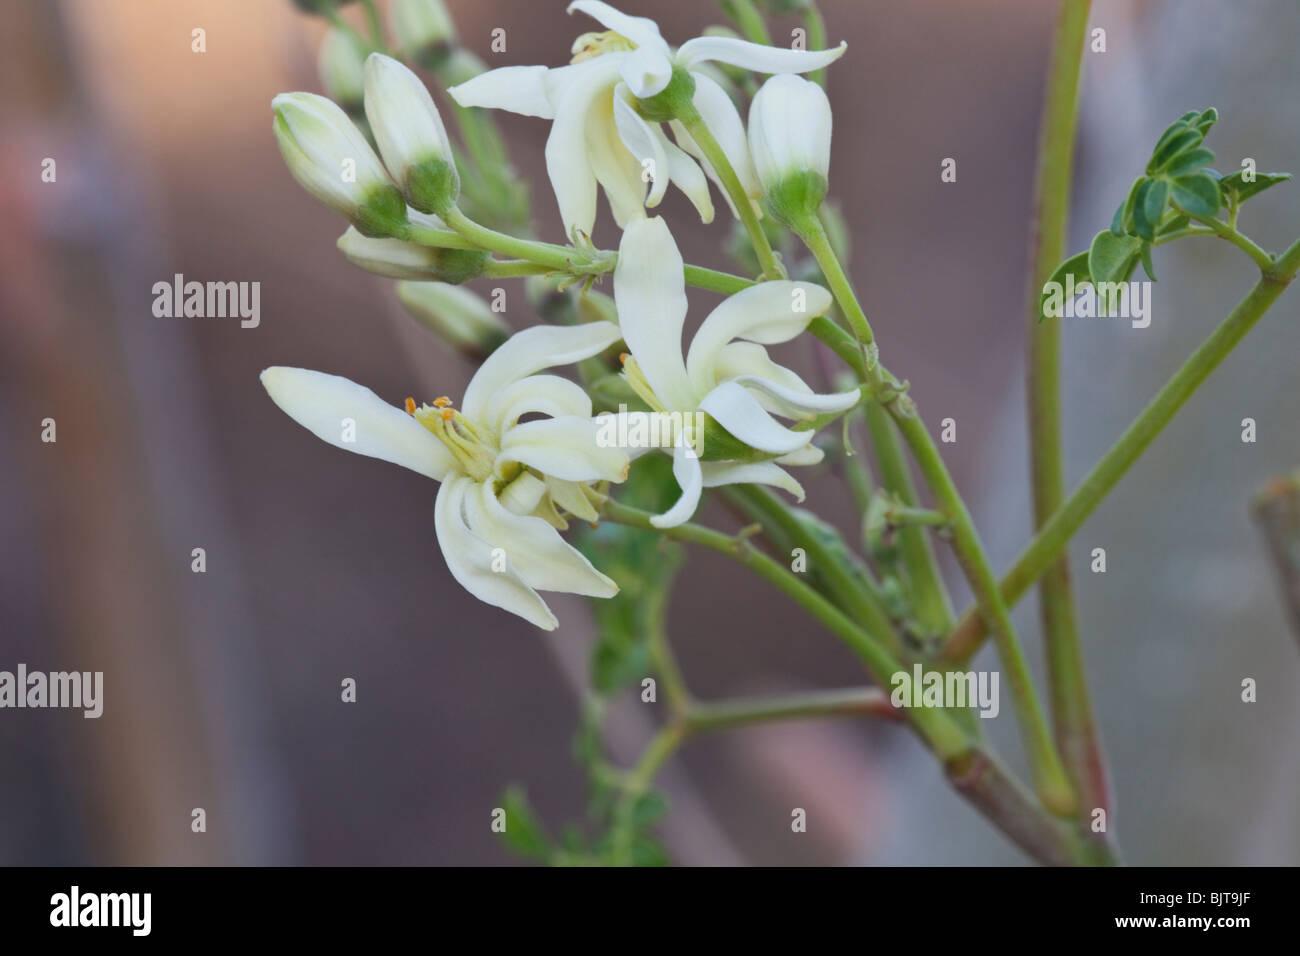 "Blumen, Moringa ""Moringa Oleifera"" Zweig. Stockbild"